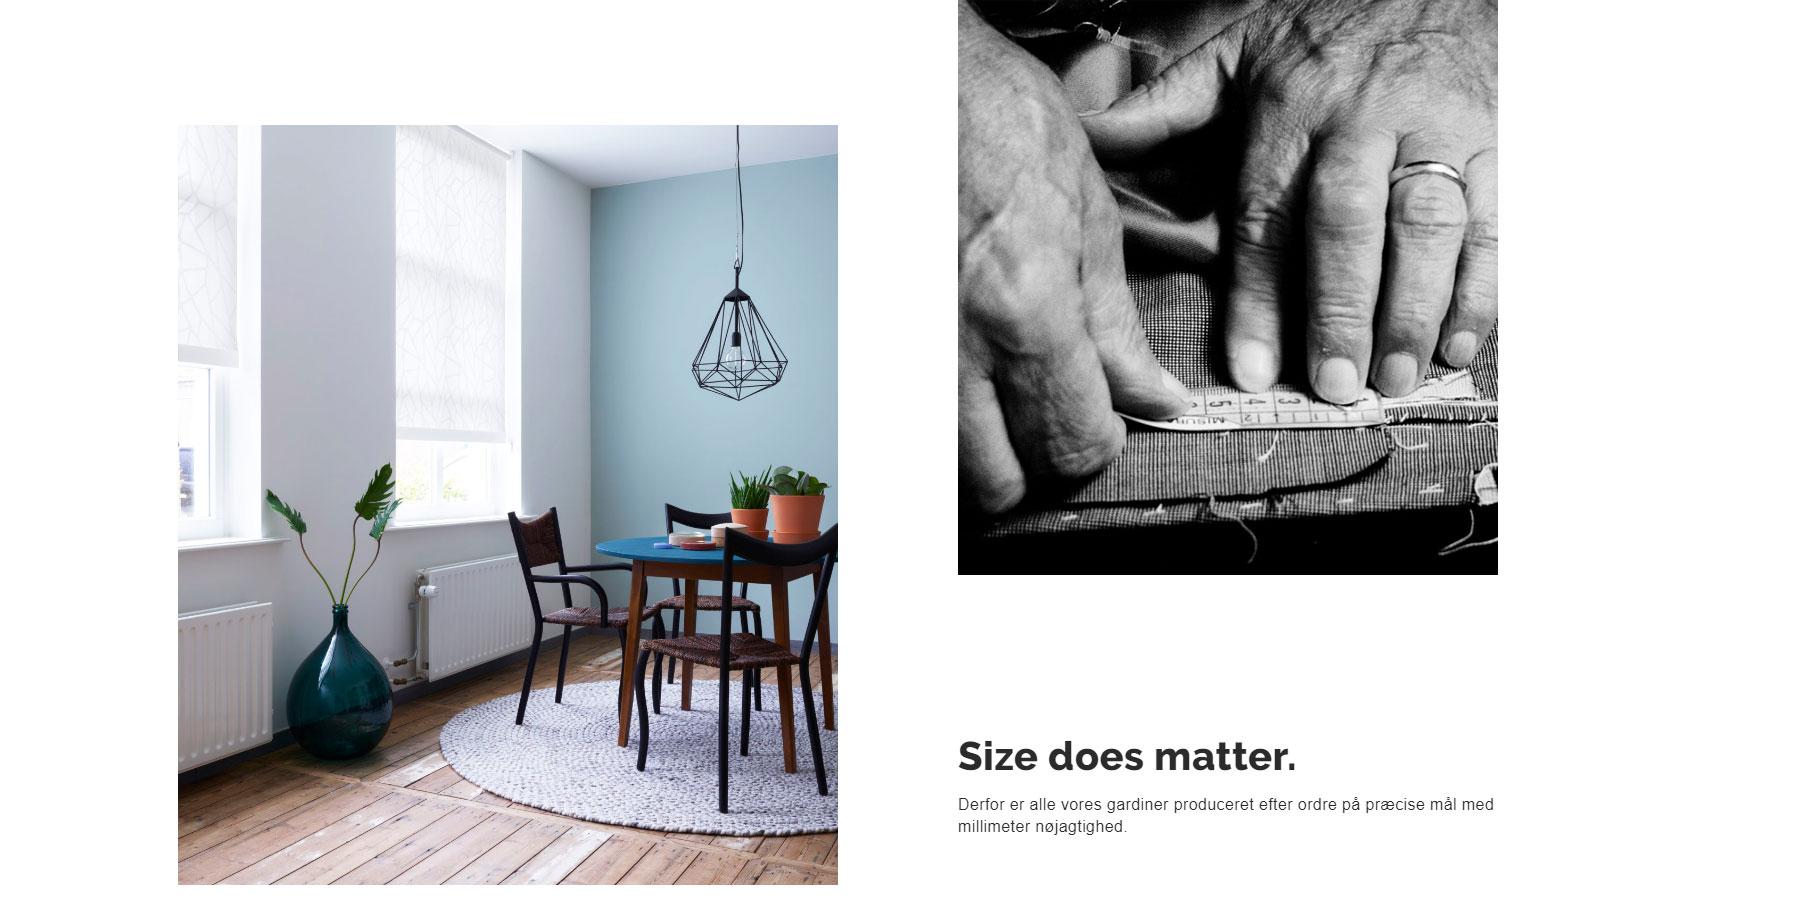 Stila website - Website of the Day